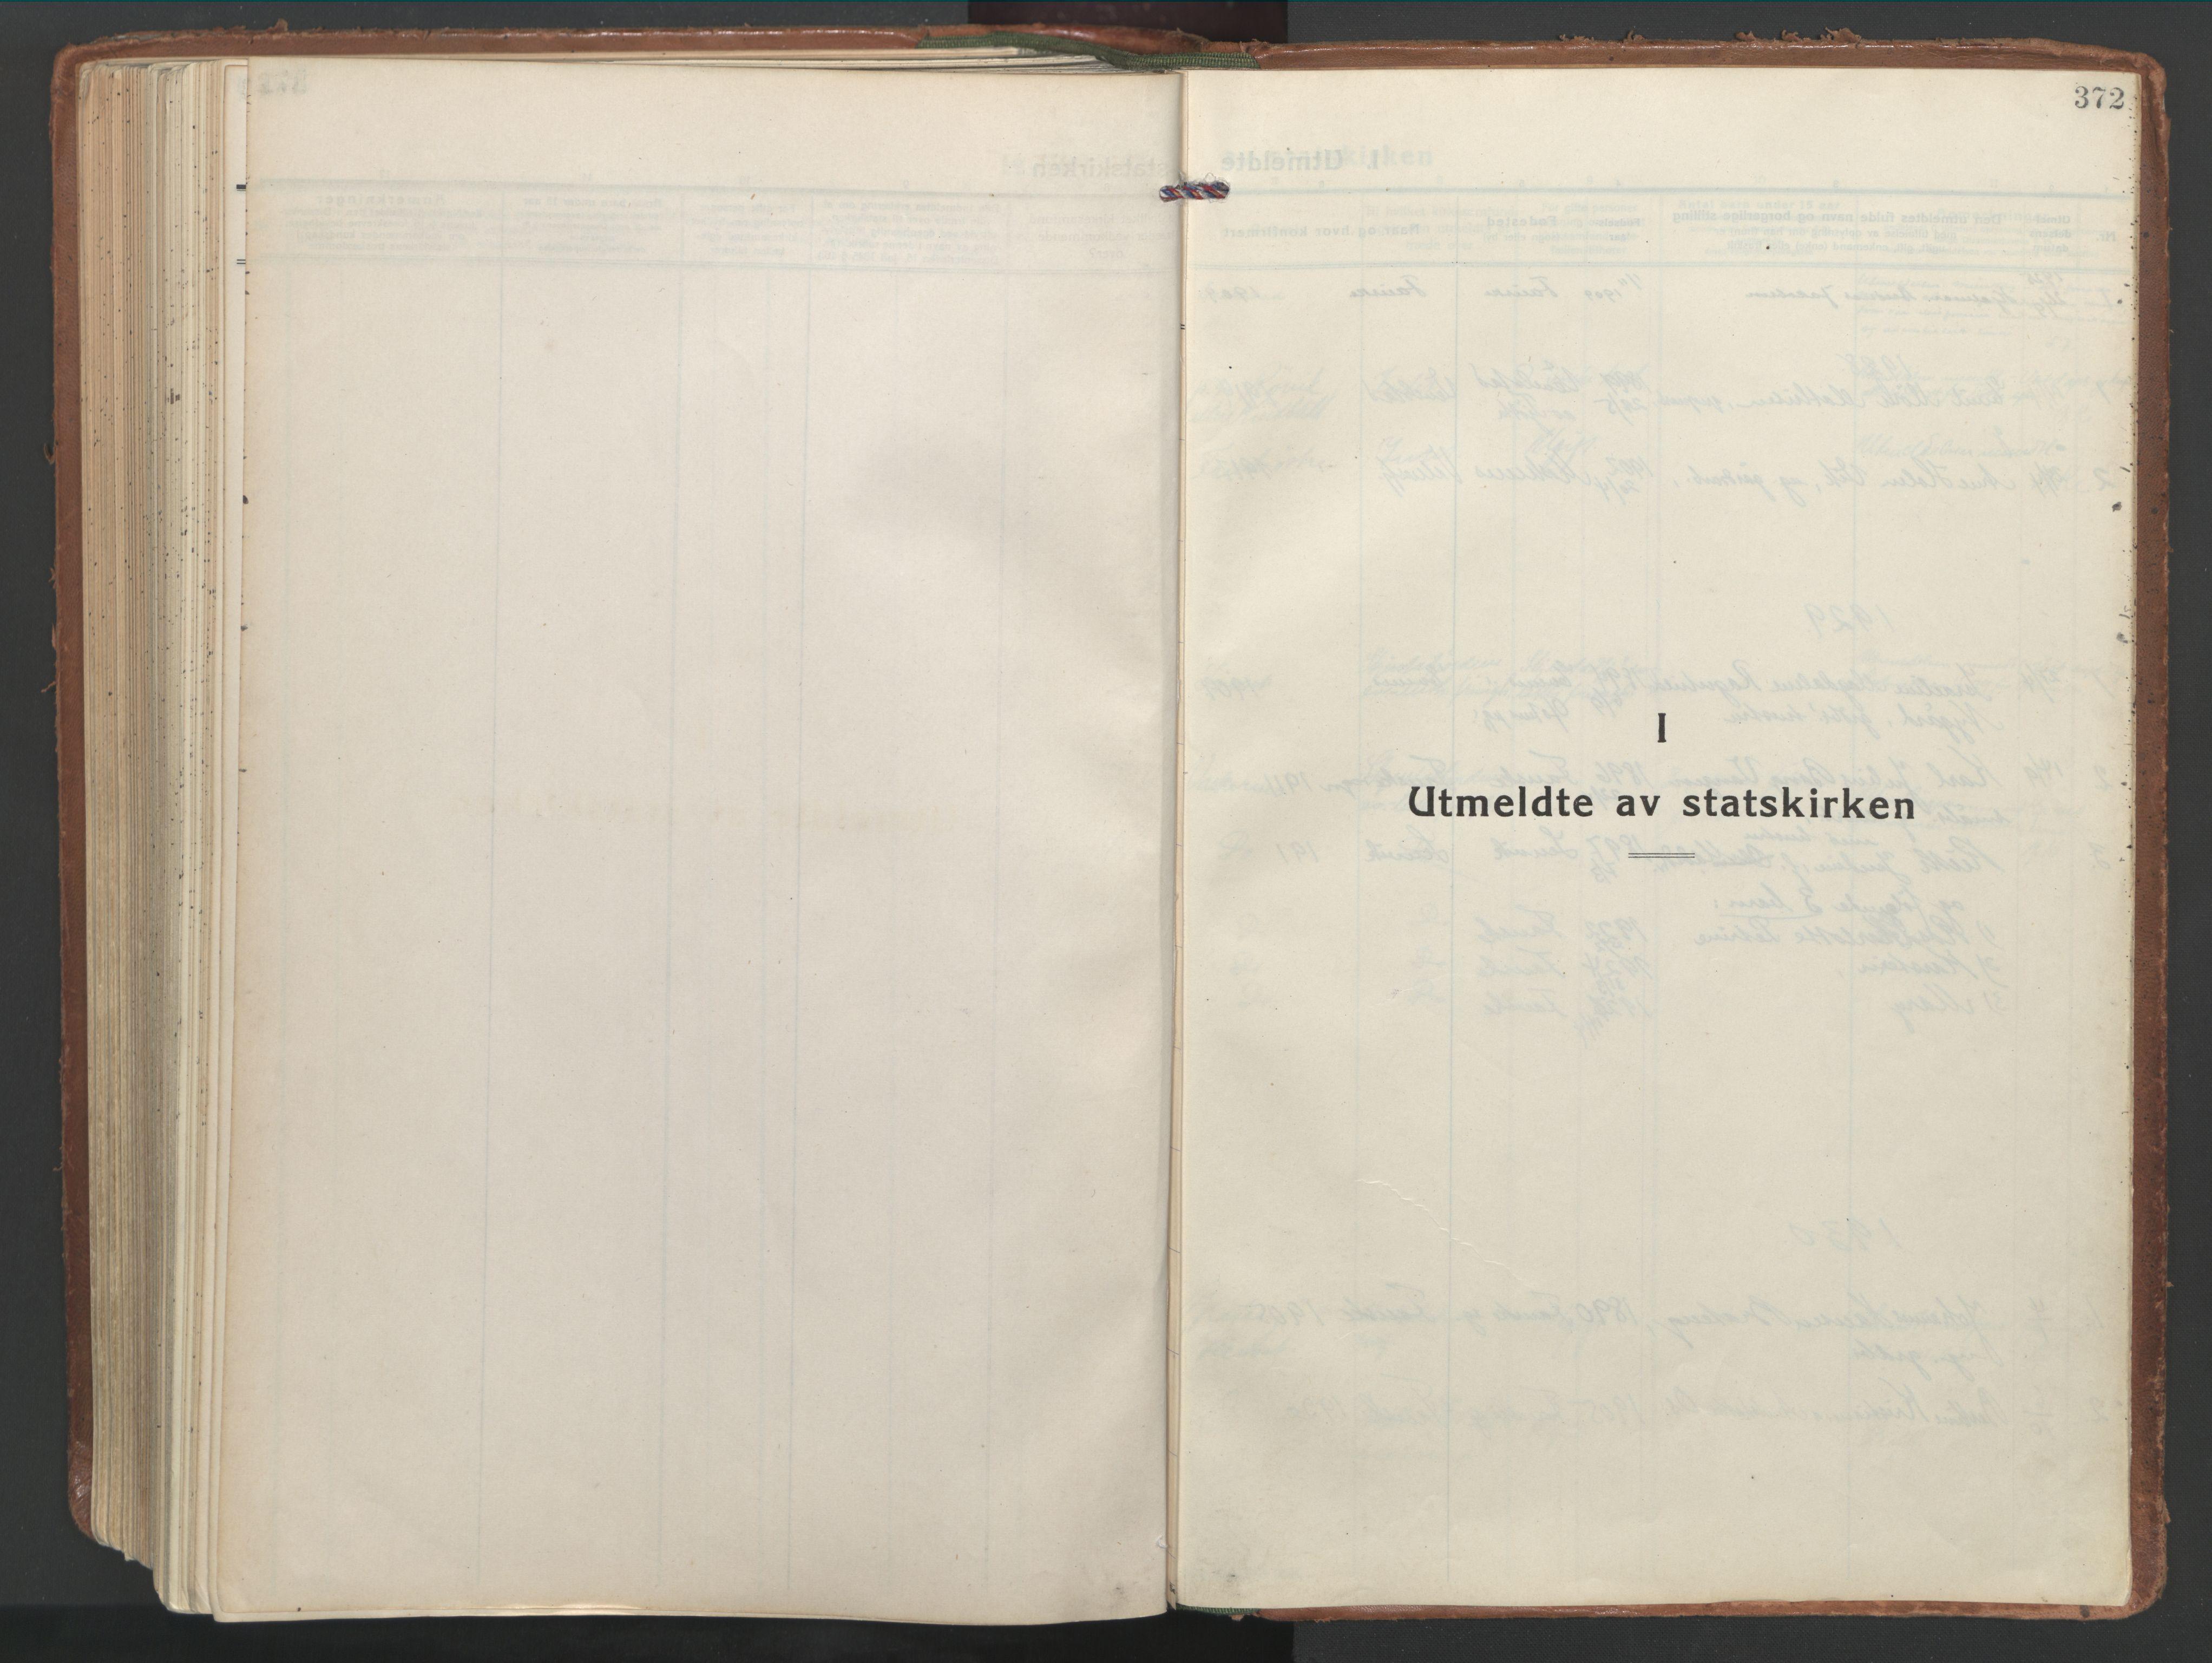 SAT, Ministerialprotokoller, klokkerbøker og fødselsregistre - Nordland, 849/L0699: Ministerialbok nr. 849A10, 1924-1937, s. 372